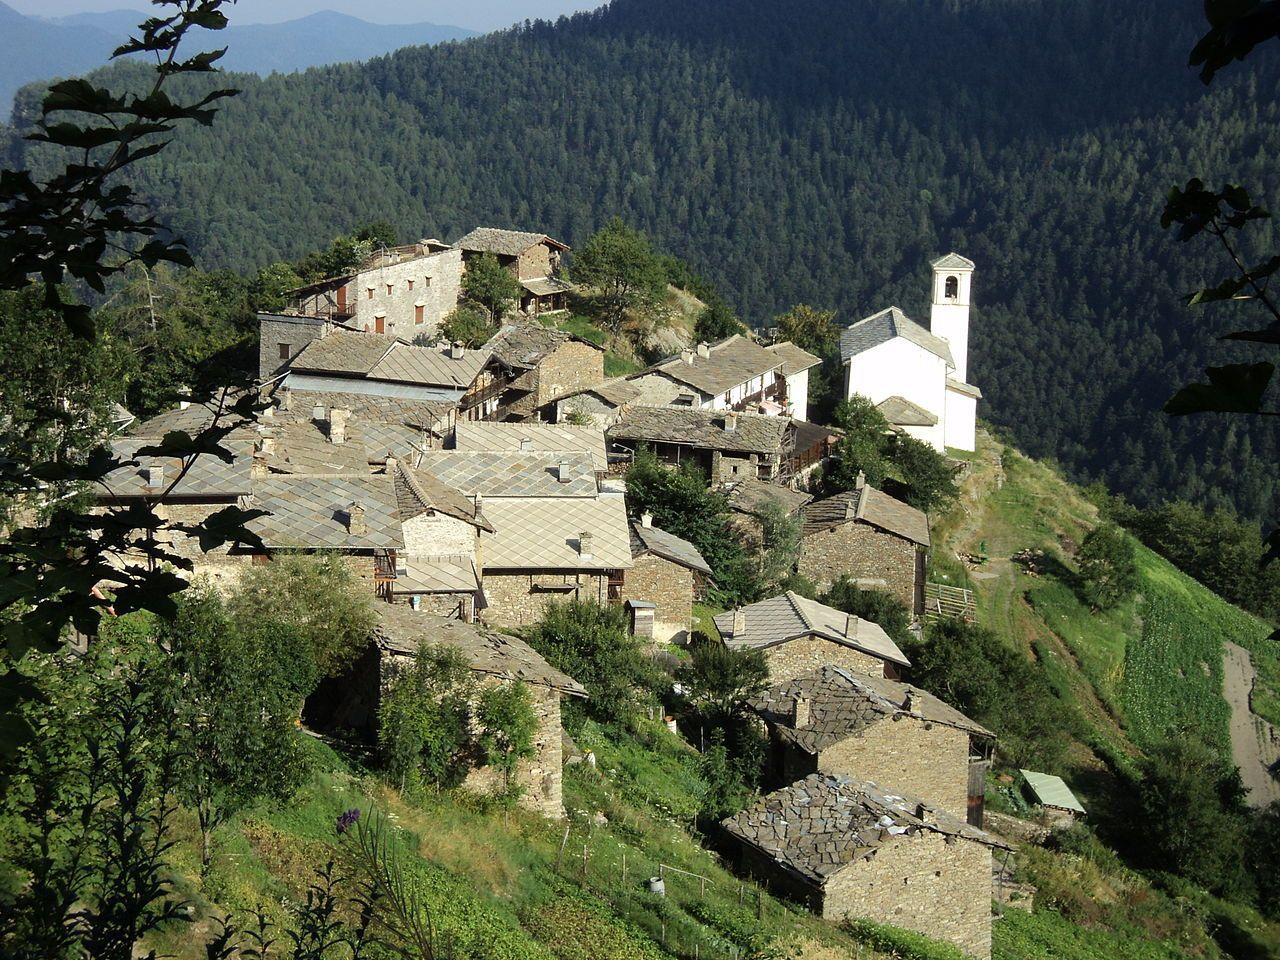 ROURE BOURCET CHASTEIRAN  Il nucleo abitativo di Chasteiran. Bourcet, detto anche Chasteiran - 1.594 m Chezalet - 1.327 m Sappè - 1.337 m Serrondet - 1.550 m Chaulieres - 1.843 m